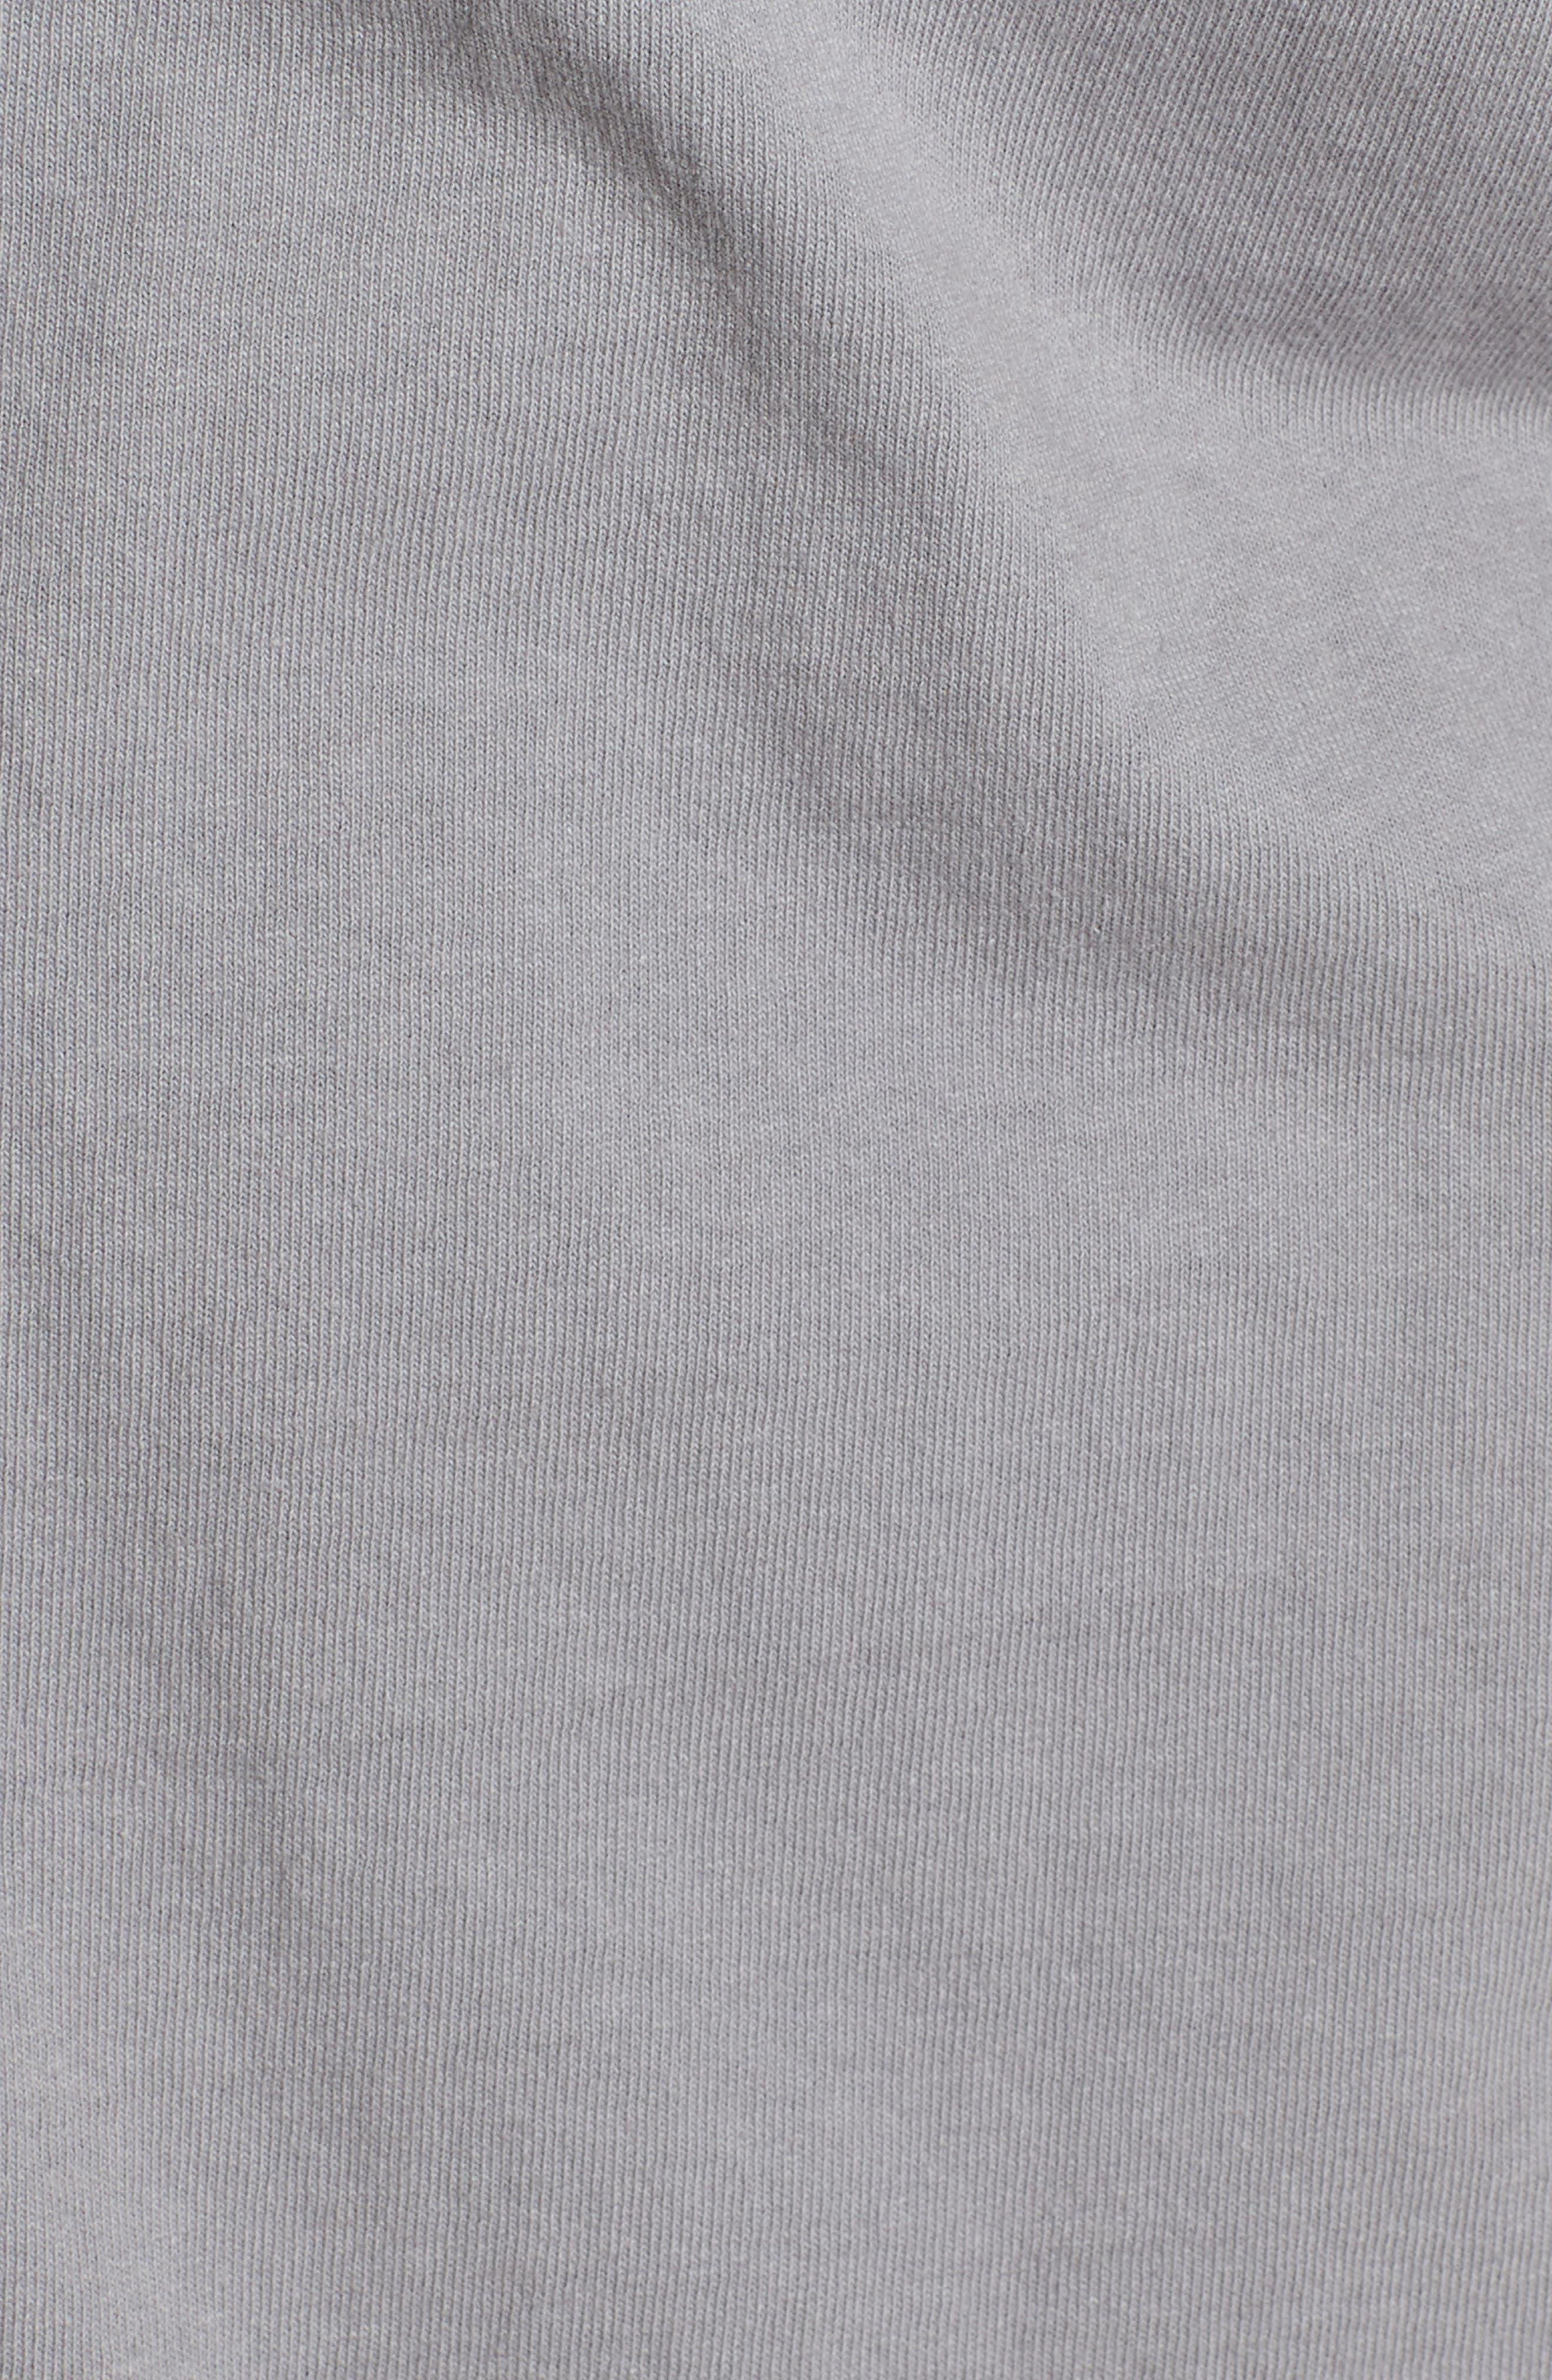 Tee Lab Knit Button Down Shirt,                             Alternate thumbnail 5, color,                             037